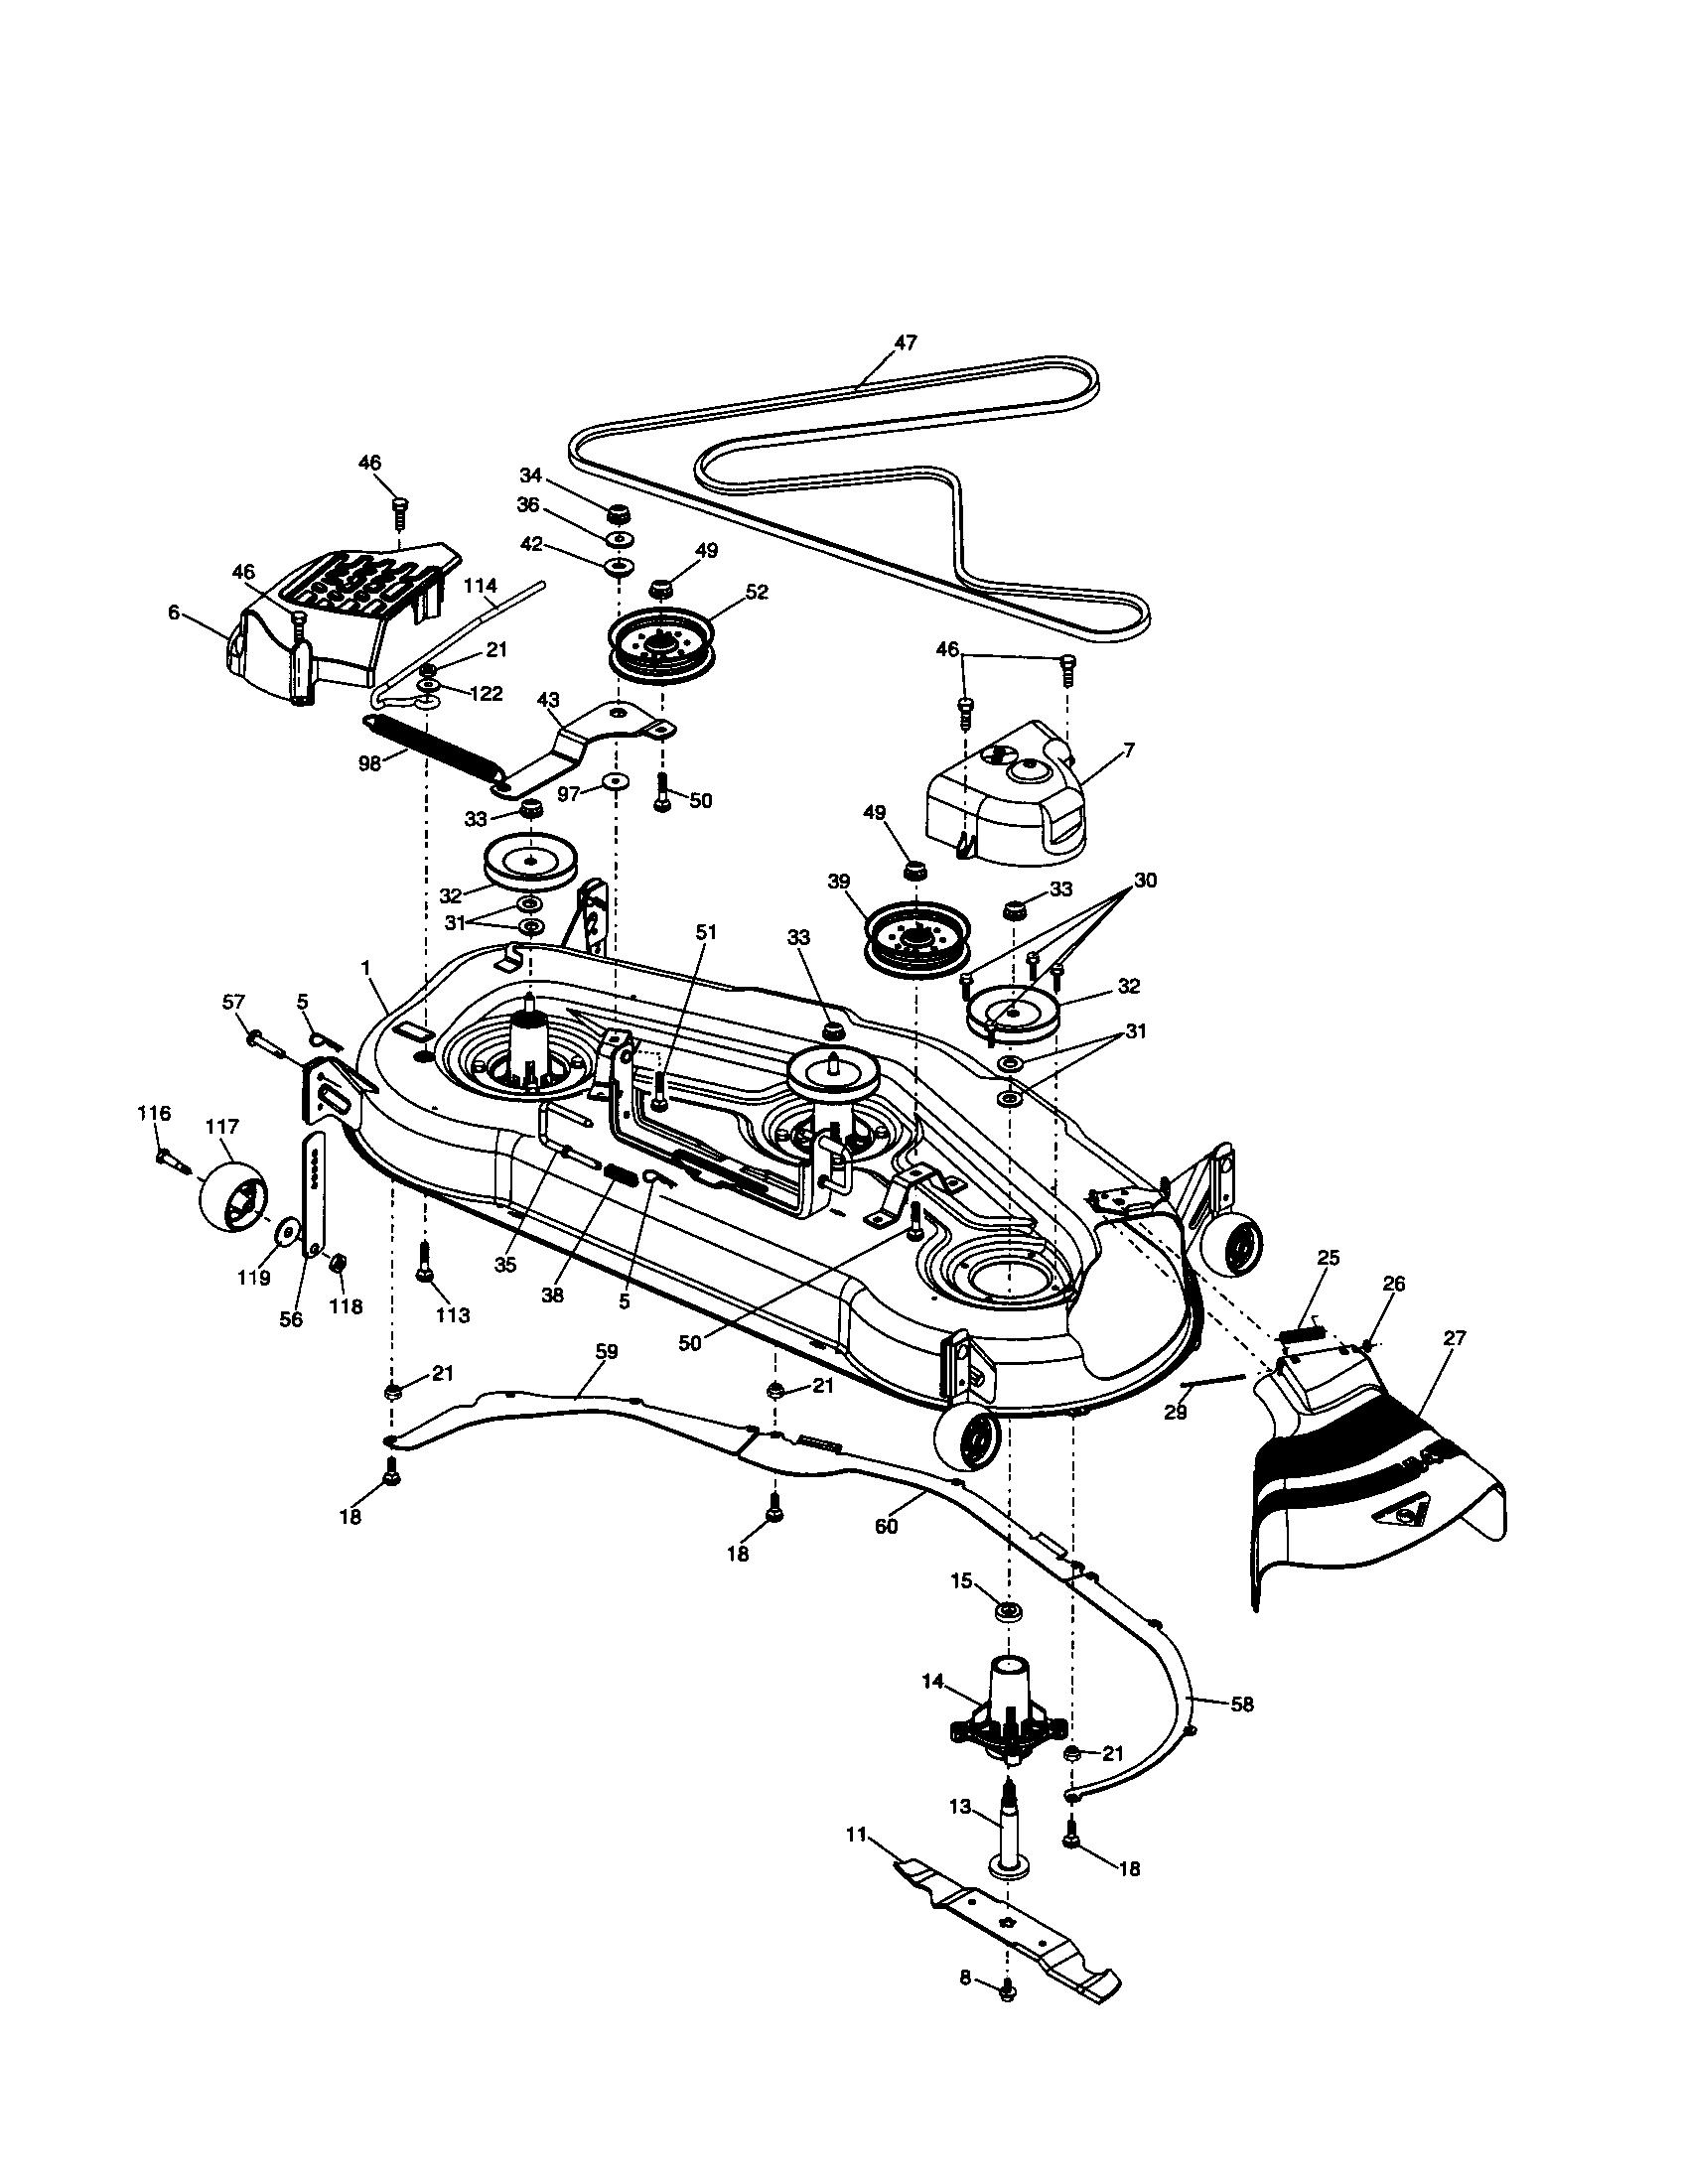 husqvarna lawn mower parts diagram vw lupo wiring riding best library model gt2254 tractor genuine rh searspartsdirect com z4217 schematics 52